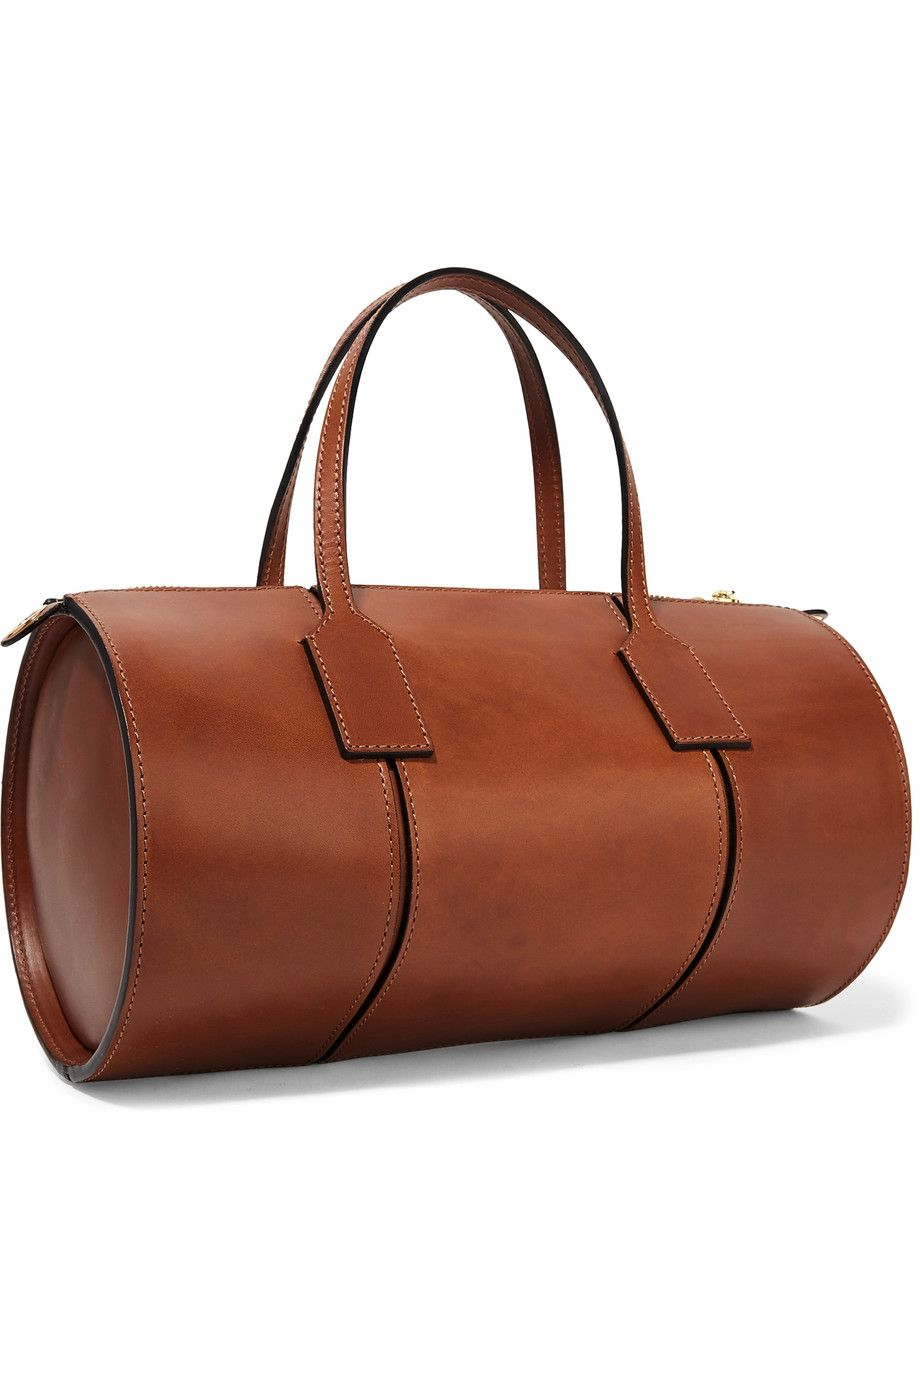 Loewe Barrel Leather Tote Net A Porter Com Bag